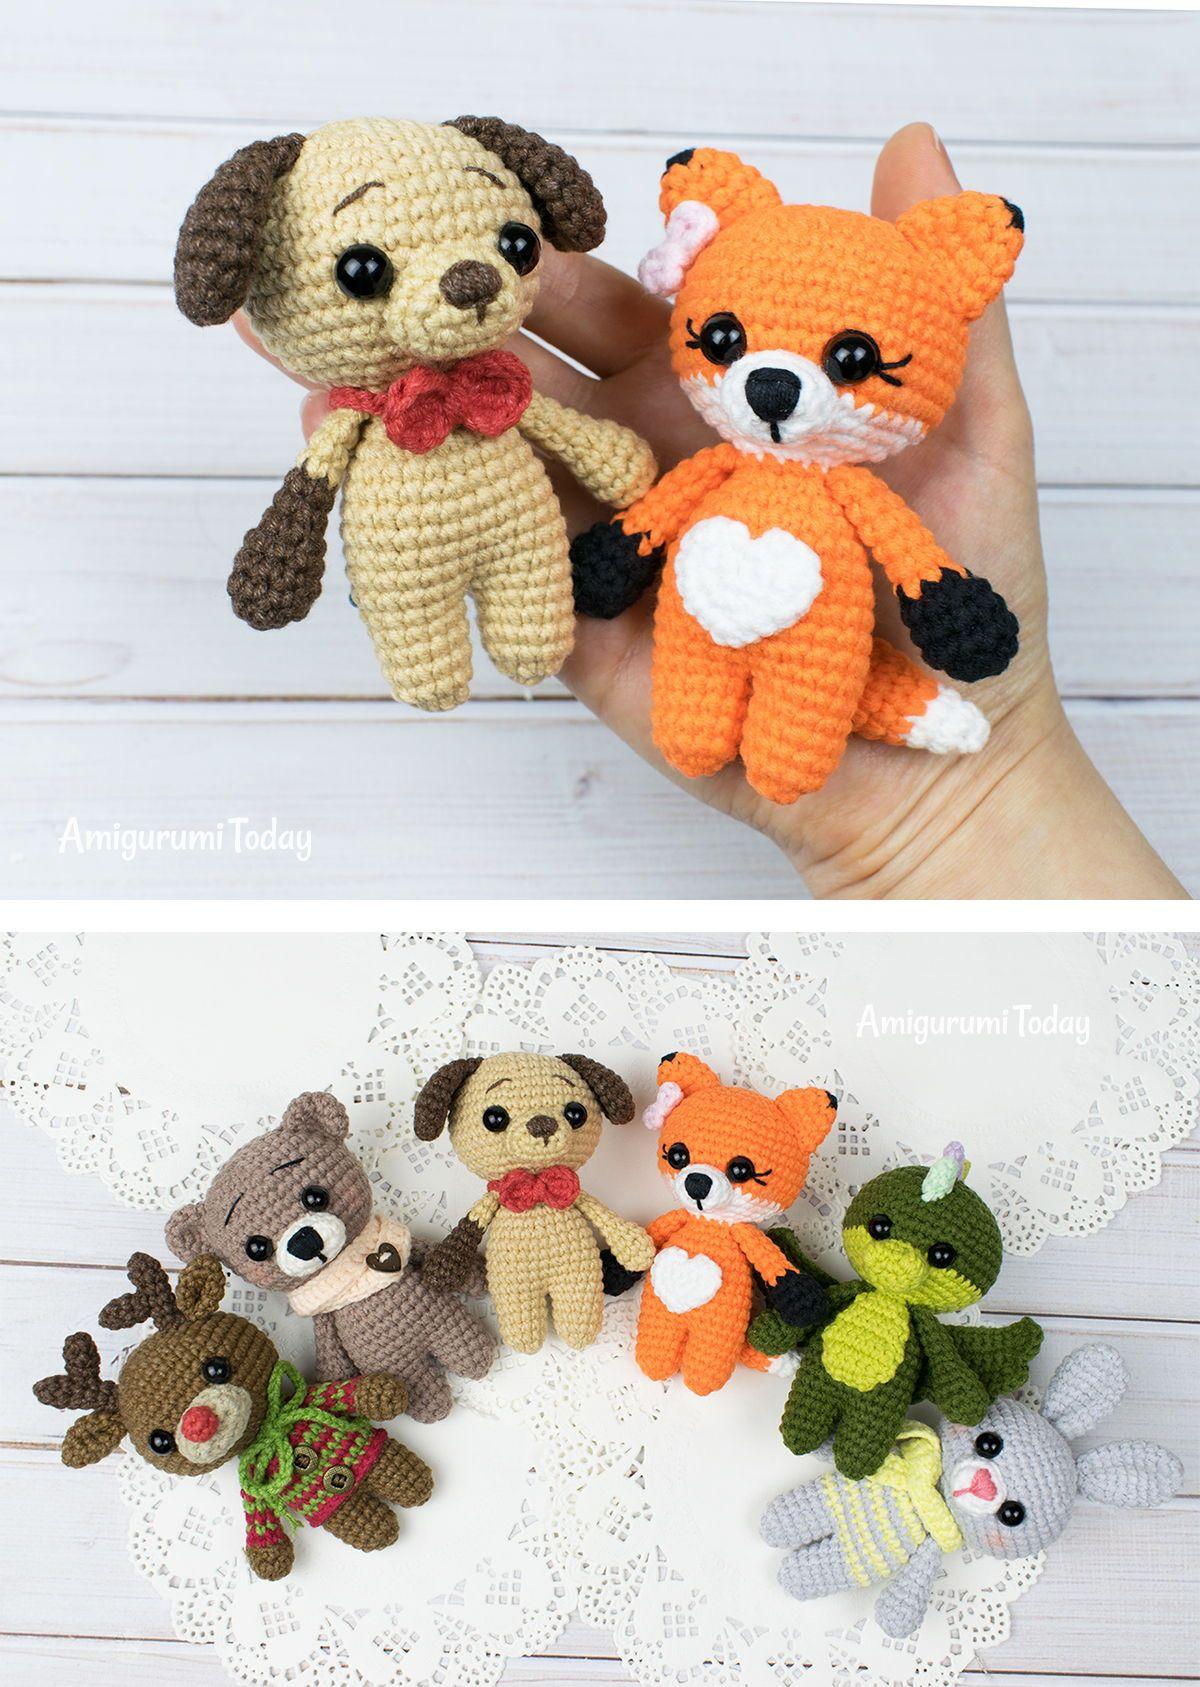 Amigurumi Miniature Animals Free Crochet Patterns & Paid - DIY ... | 1687x1200